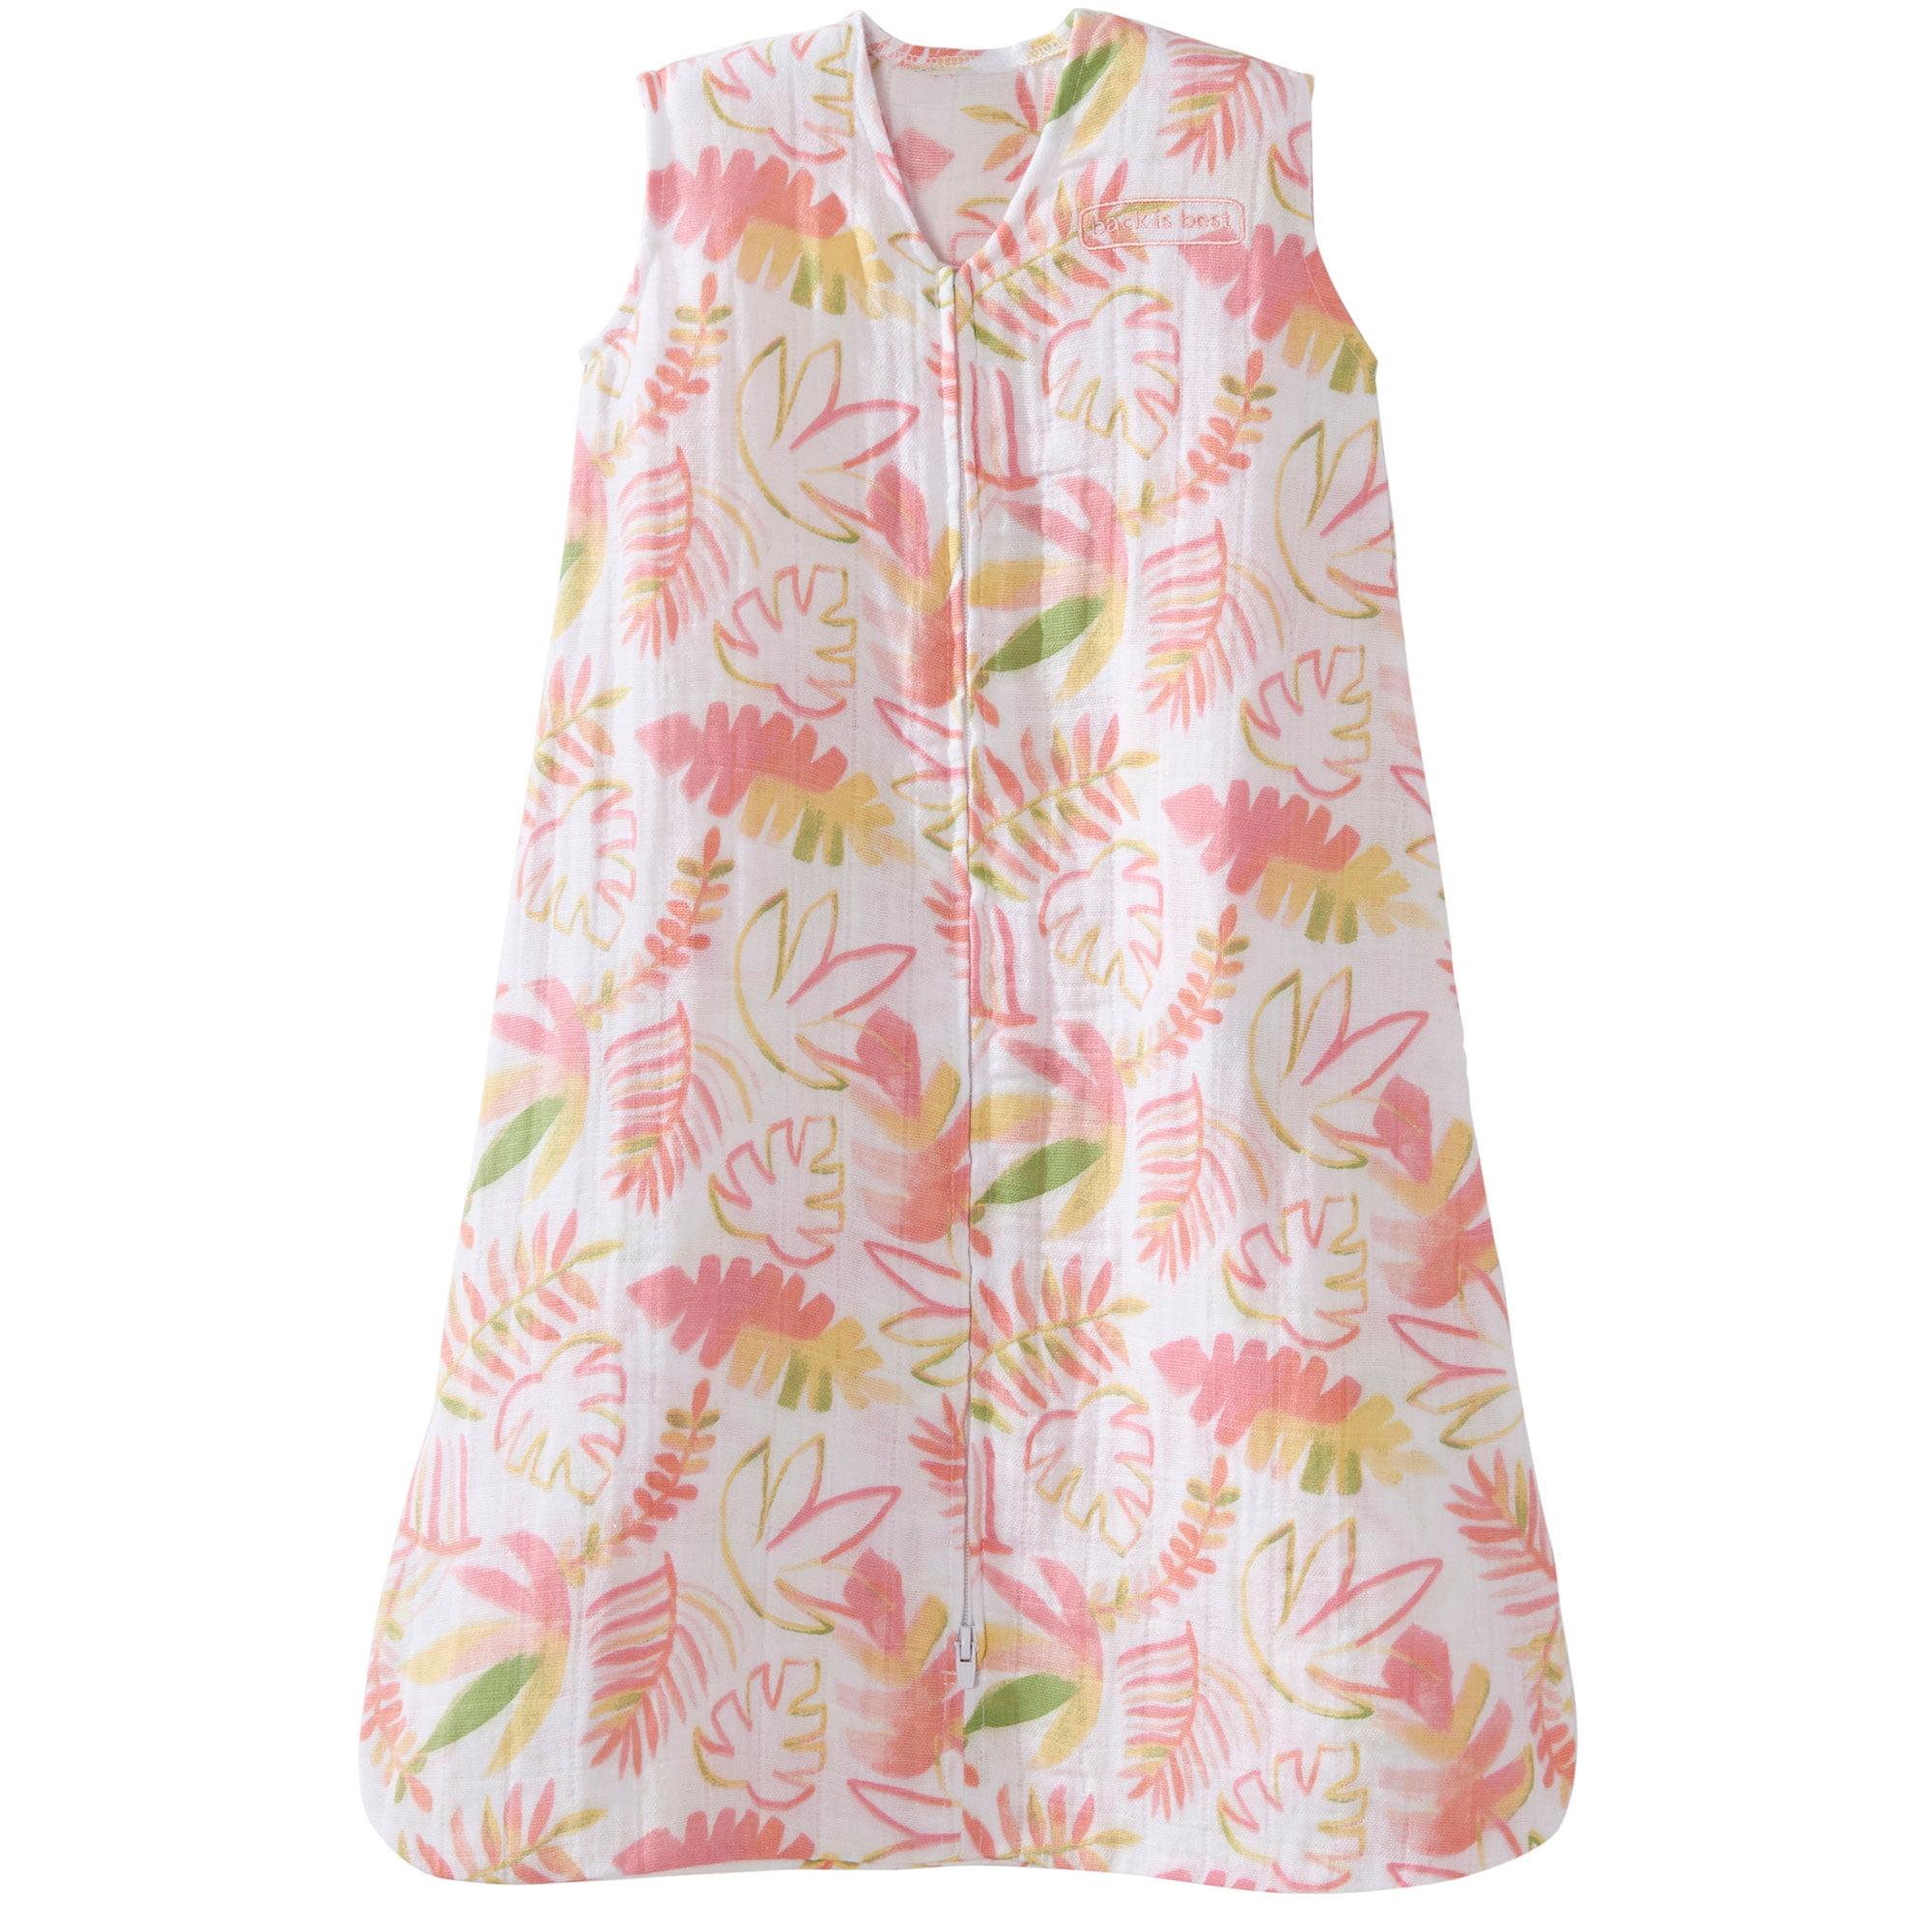 Halo 100% Cotton Muslin Baby Sleepsack Wearable Blanket, Pink Leaves, Large